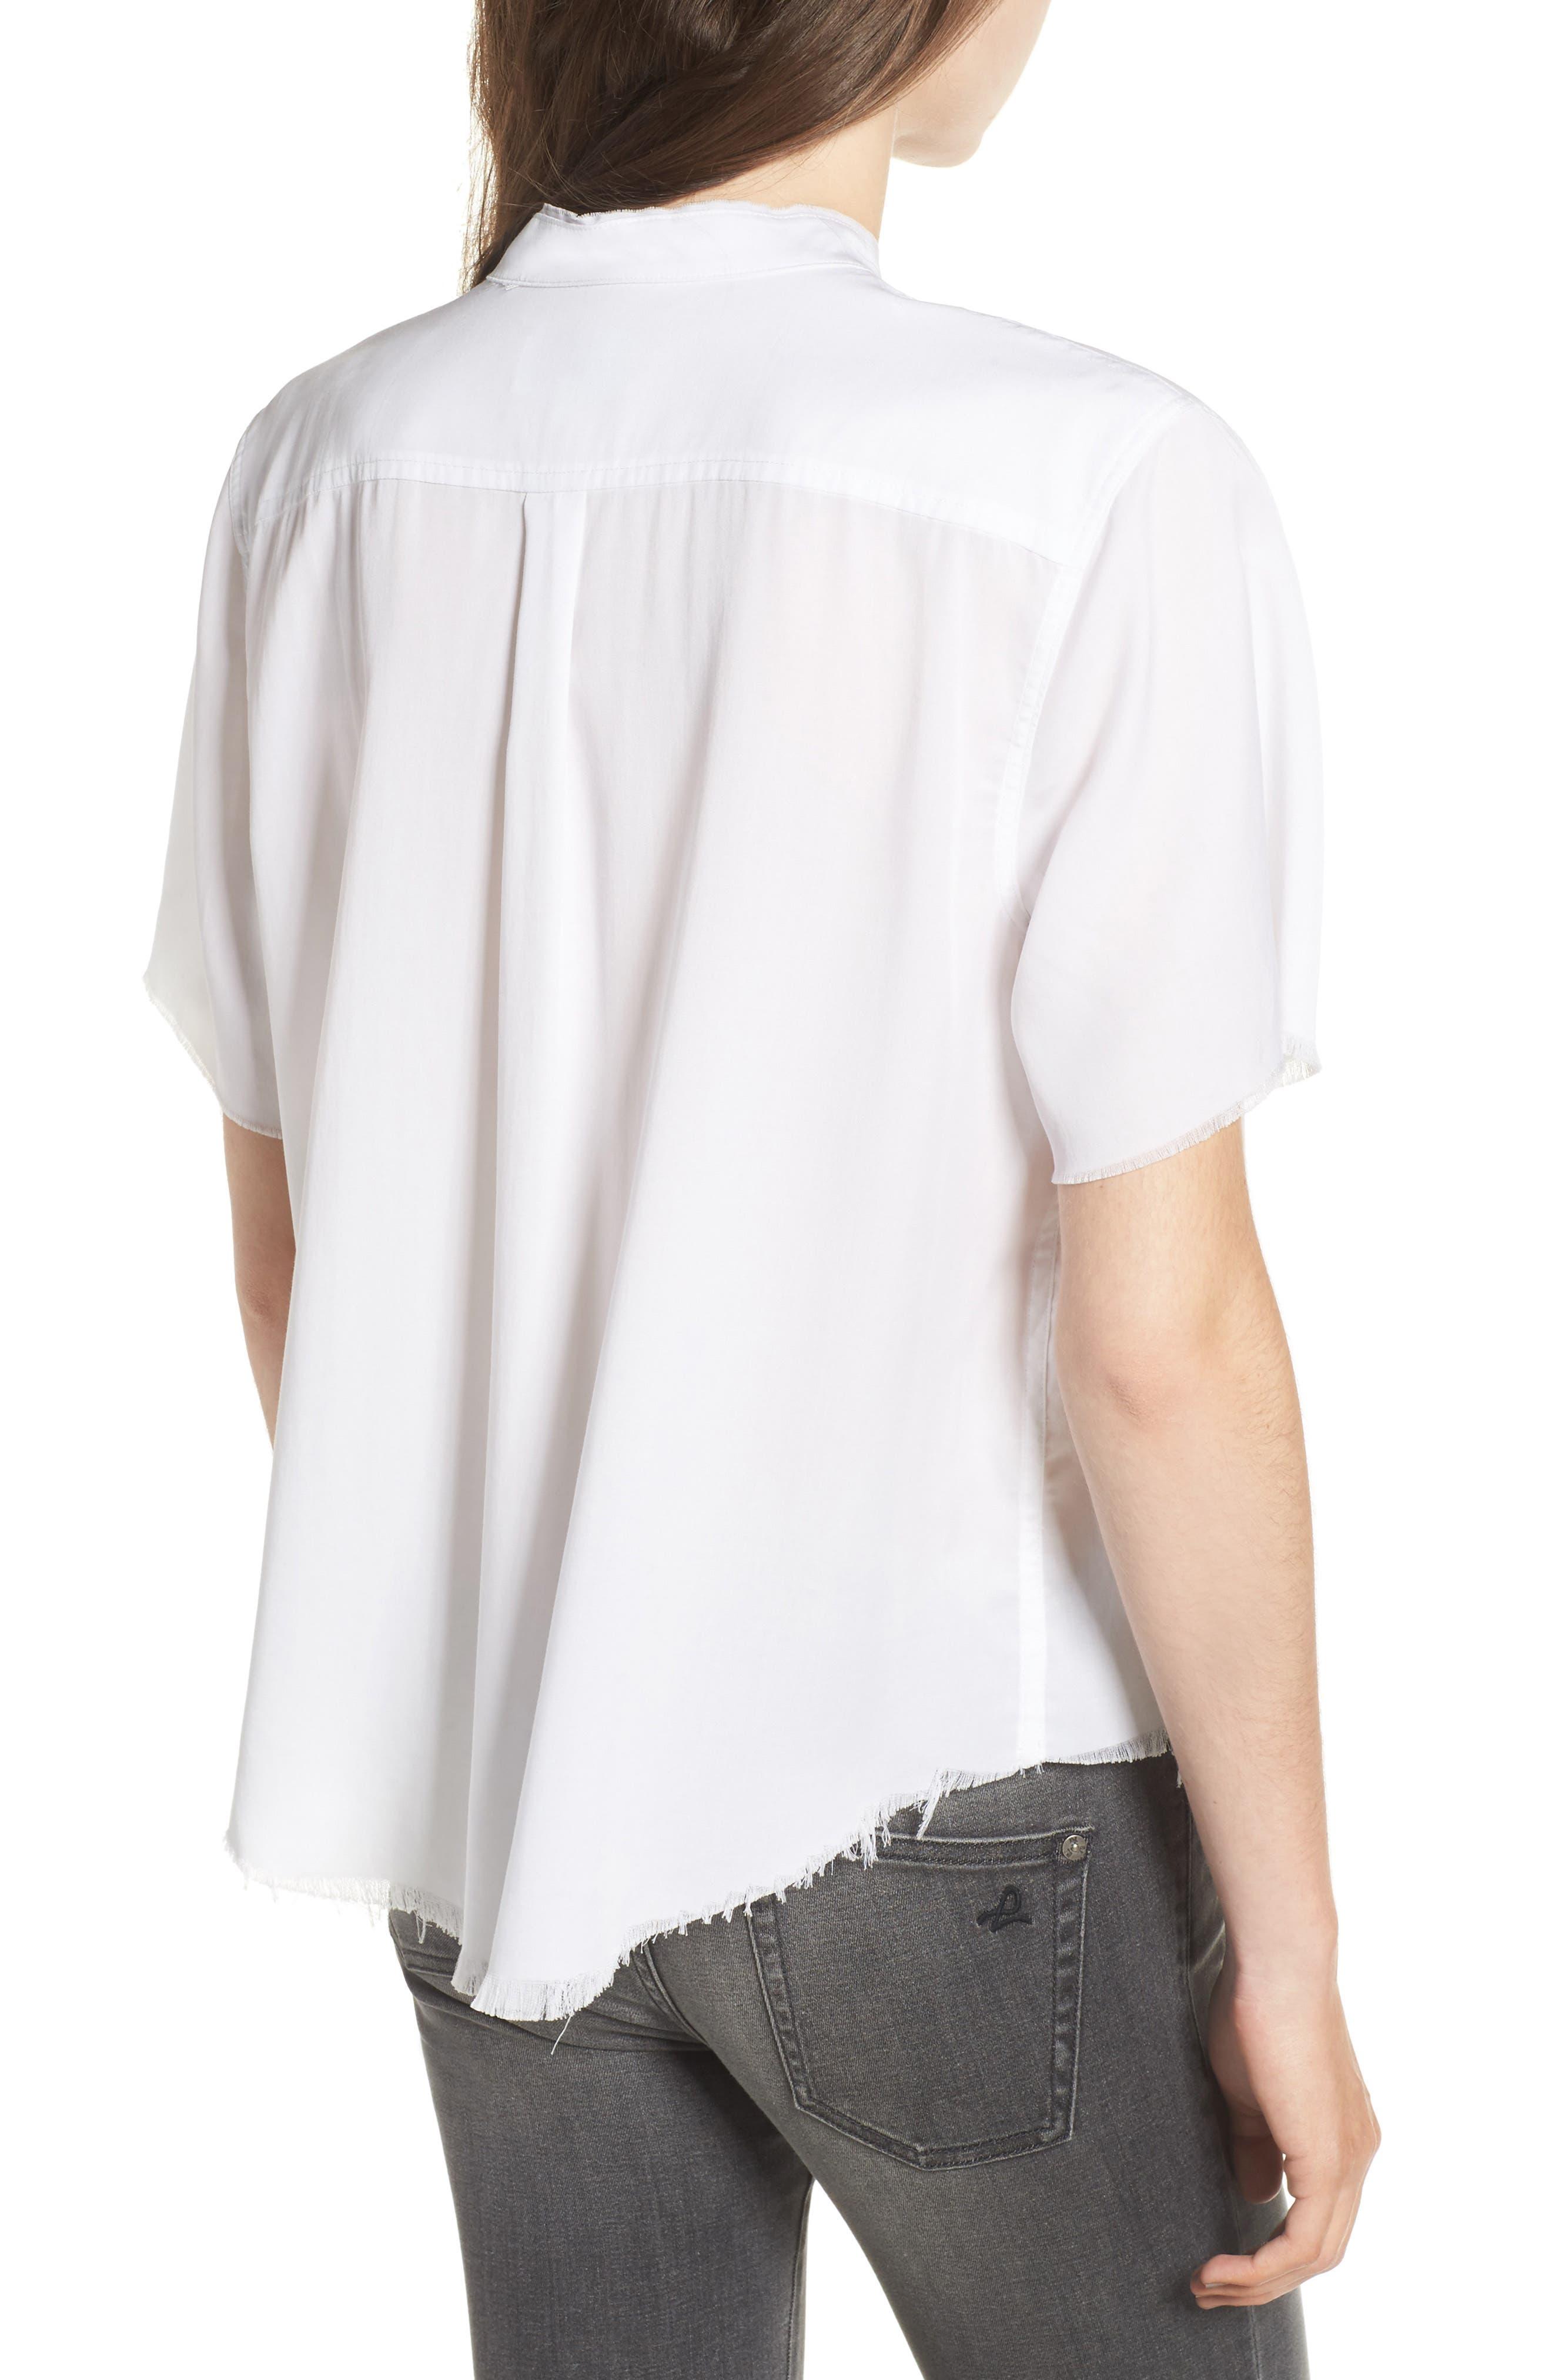 Montauk Shirt,                             Alternate thumbnail 2, color,                             100